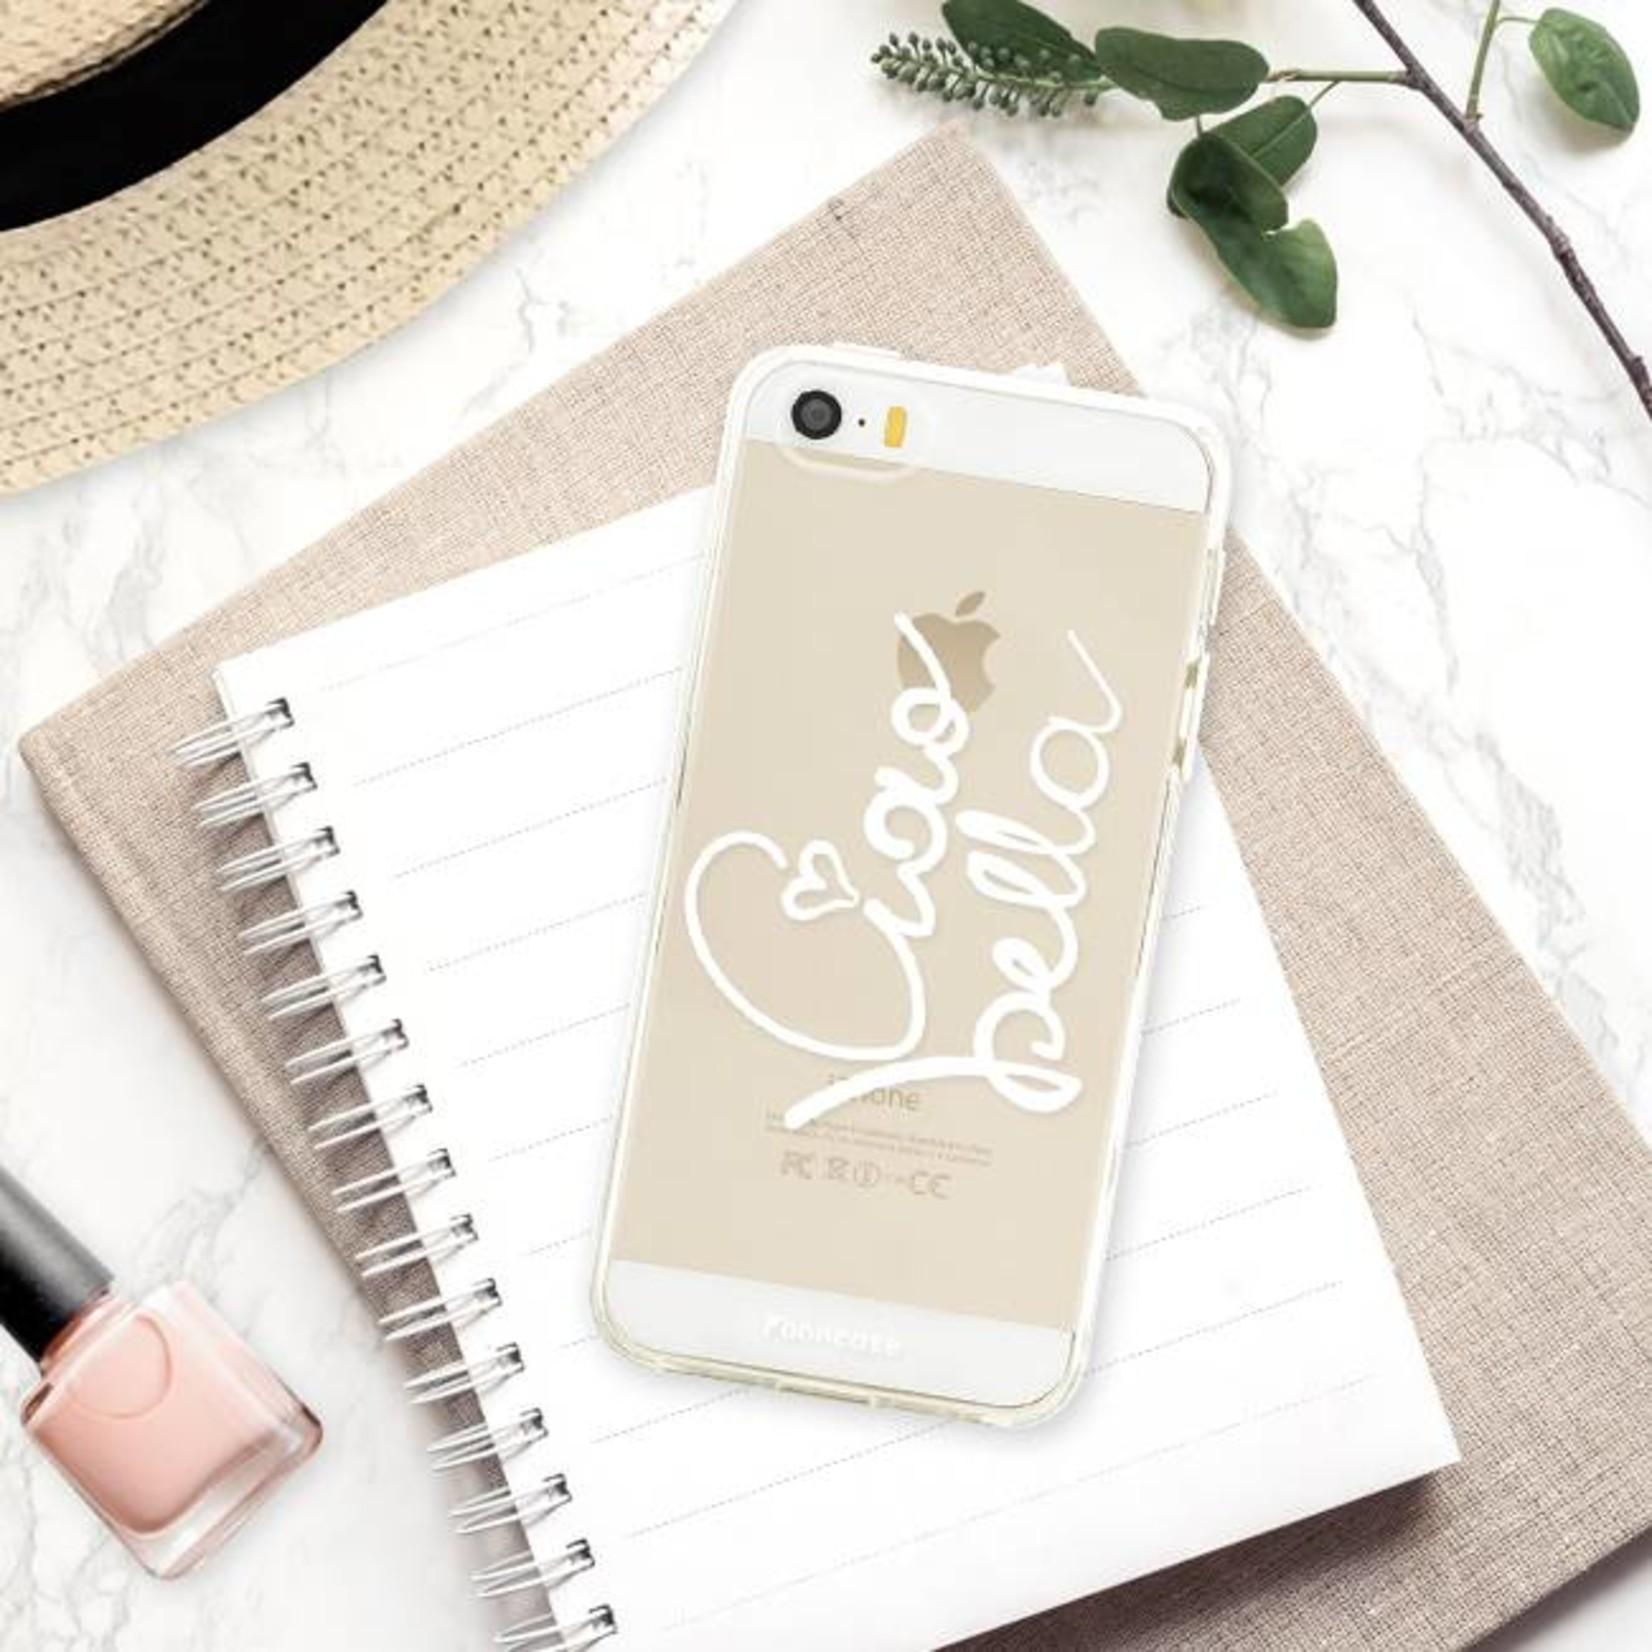 FOONCASE Iphone 5 / 5S Handyhülle - Ciao Bella!